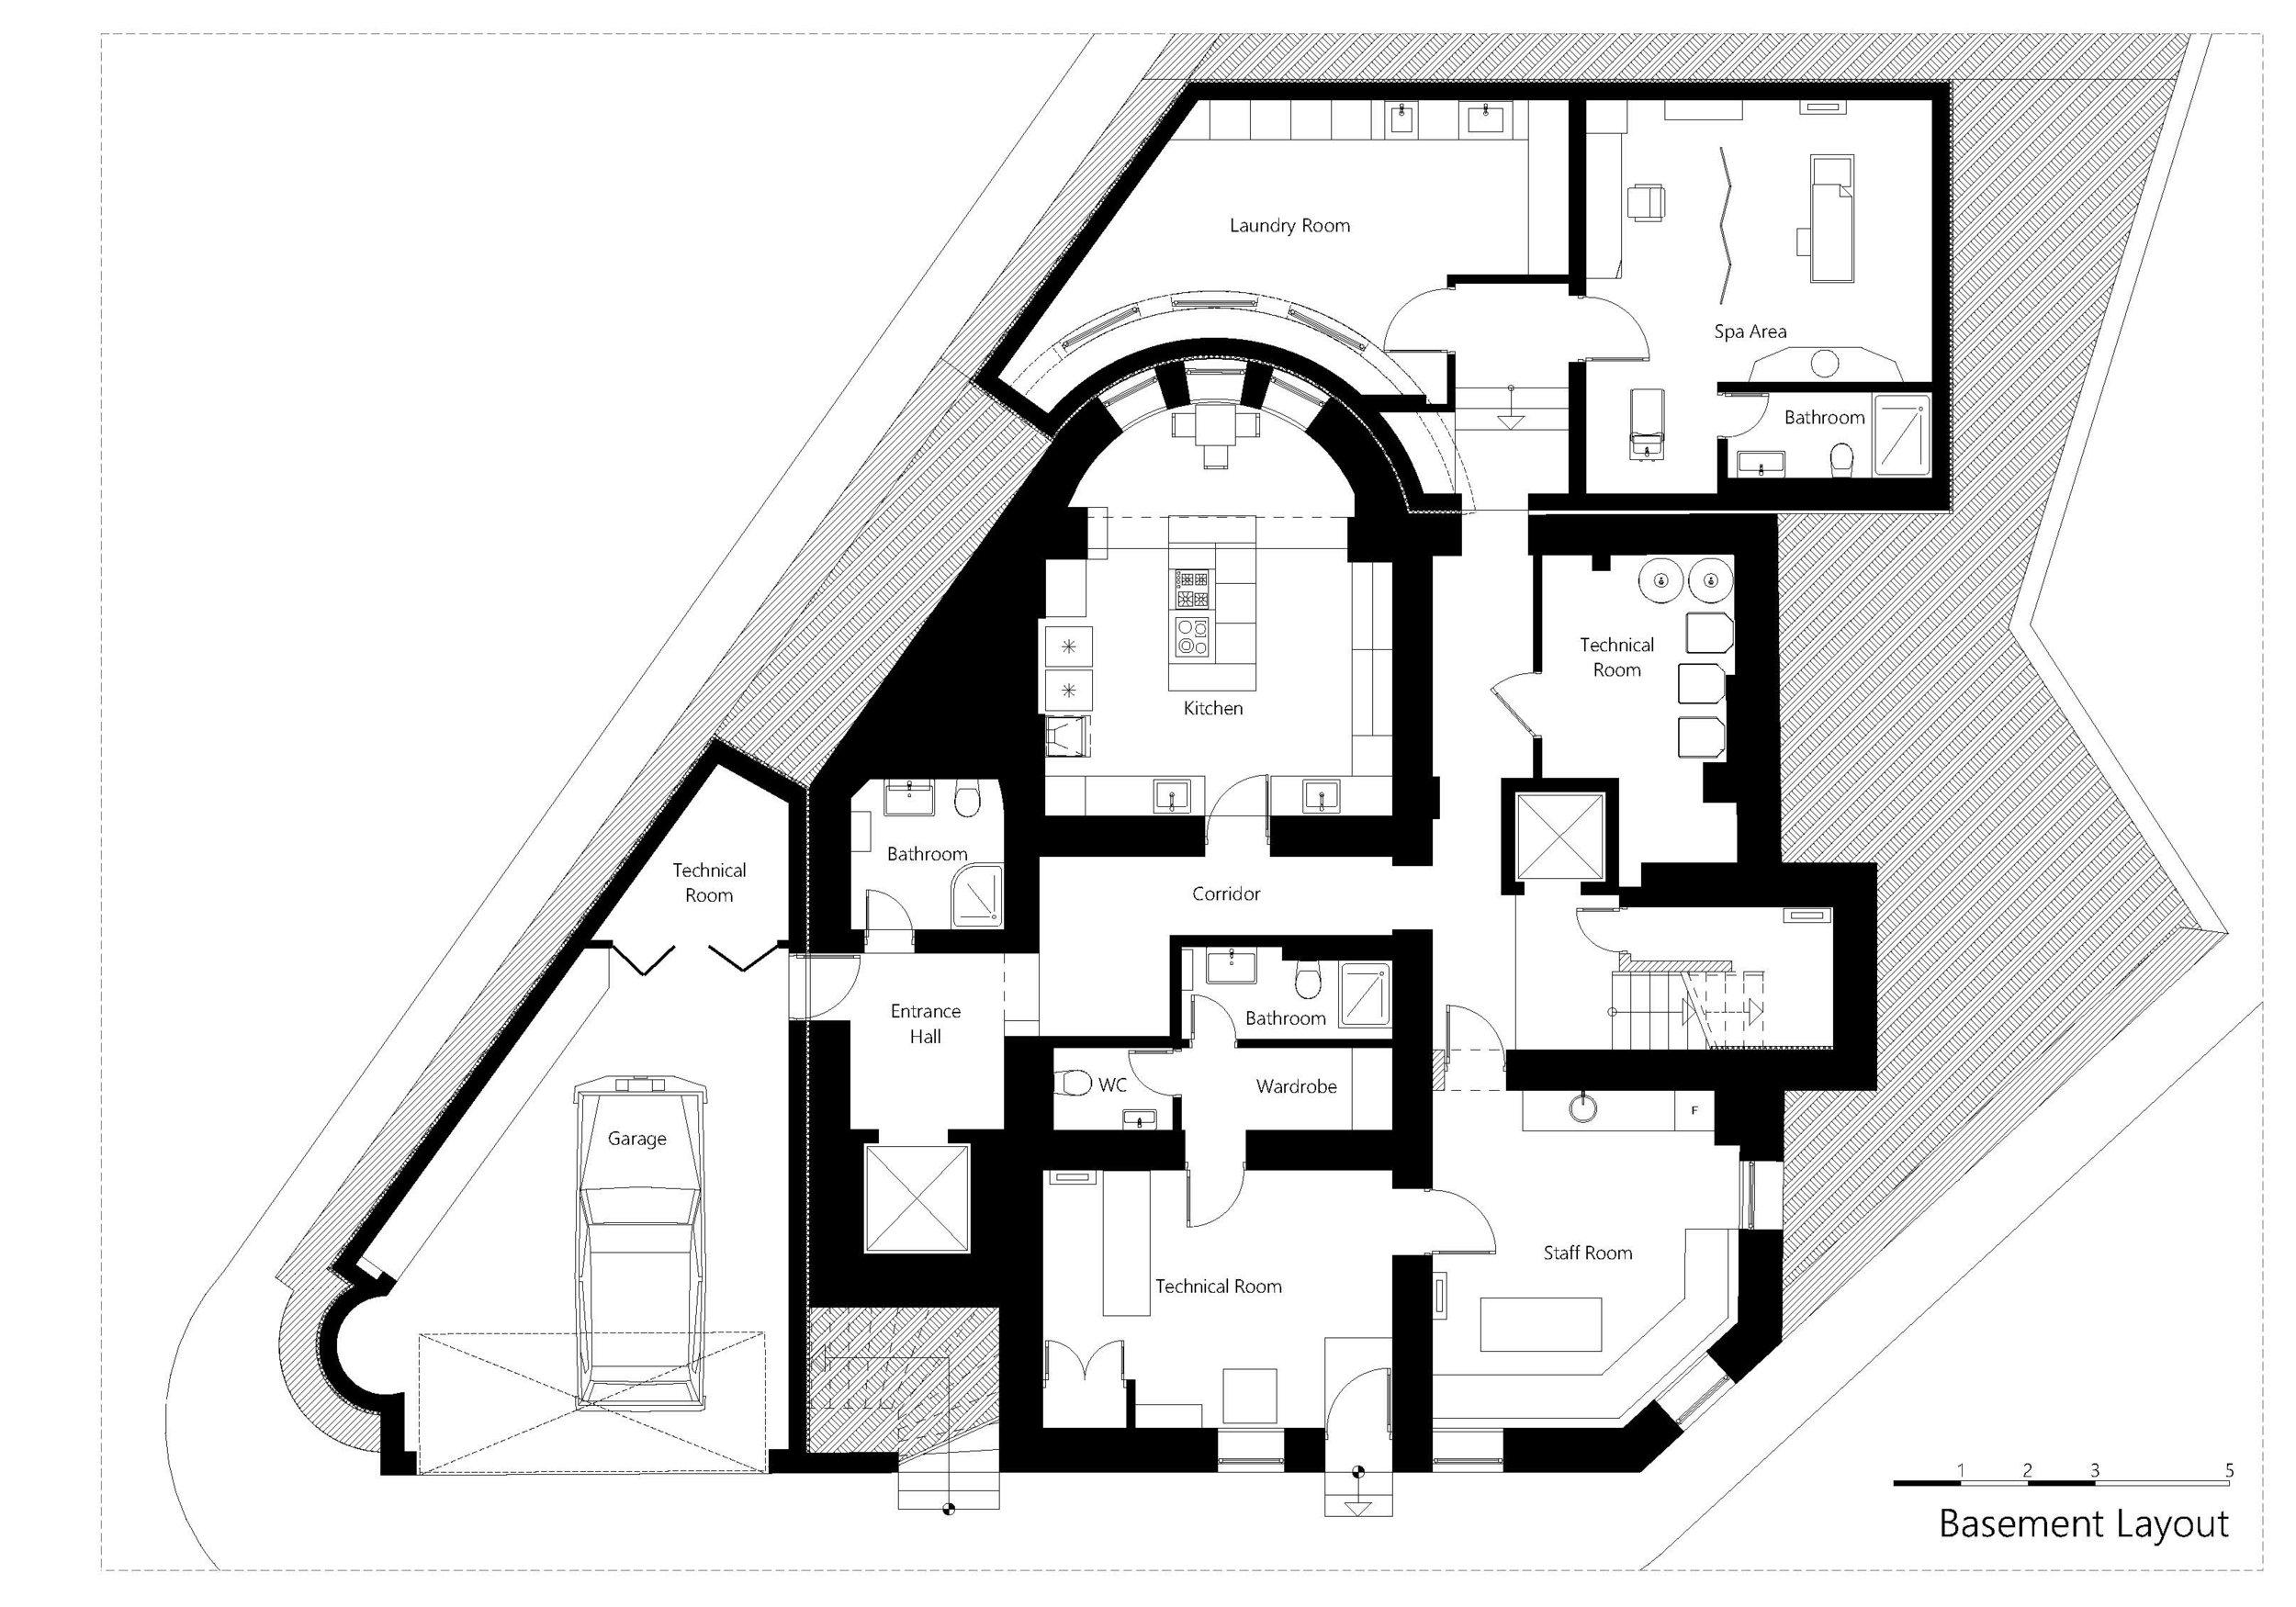 Plan base presentation_Parallel House-5.jpg